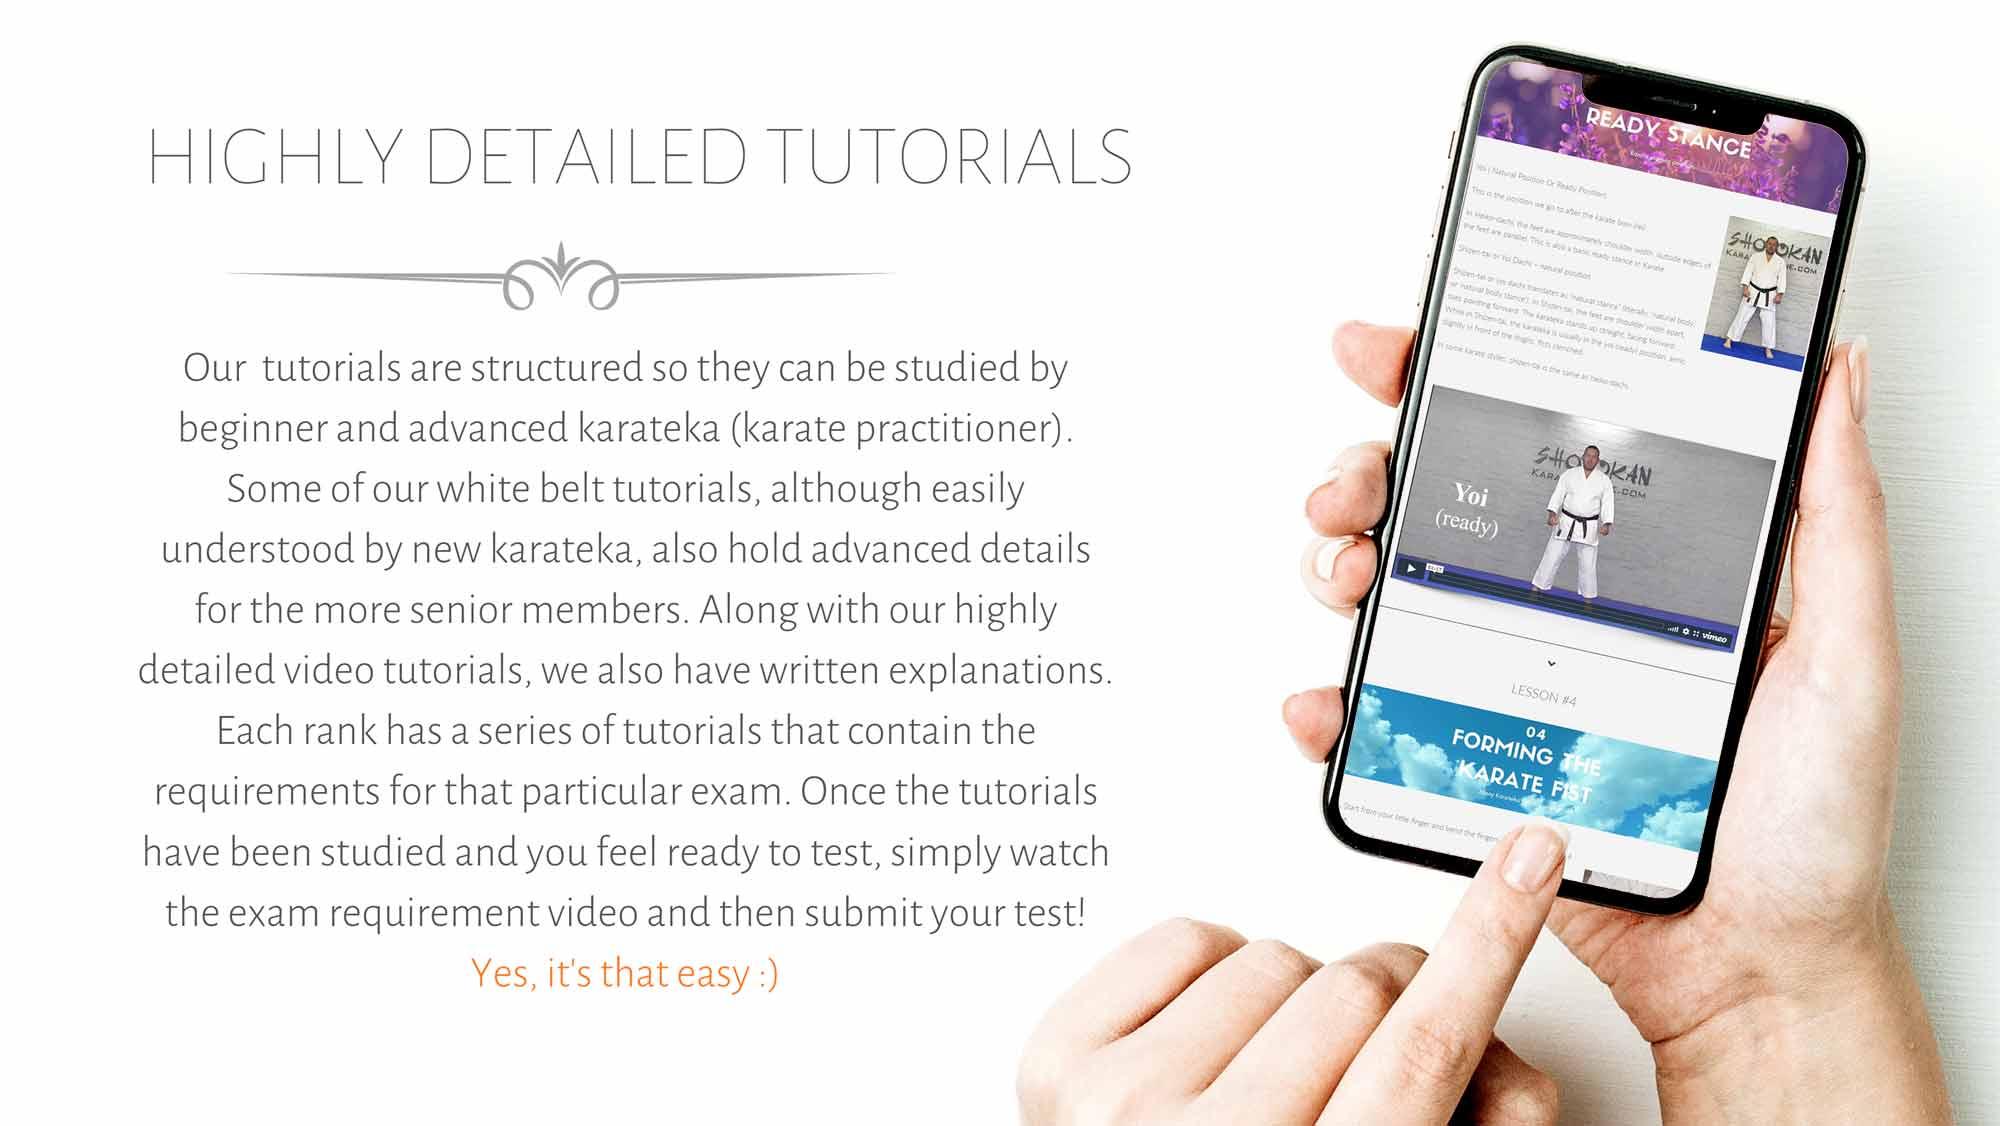 learn karate on mobile phone